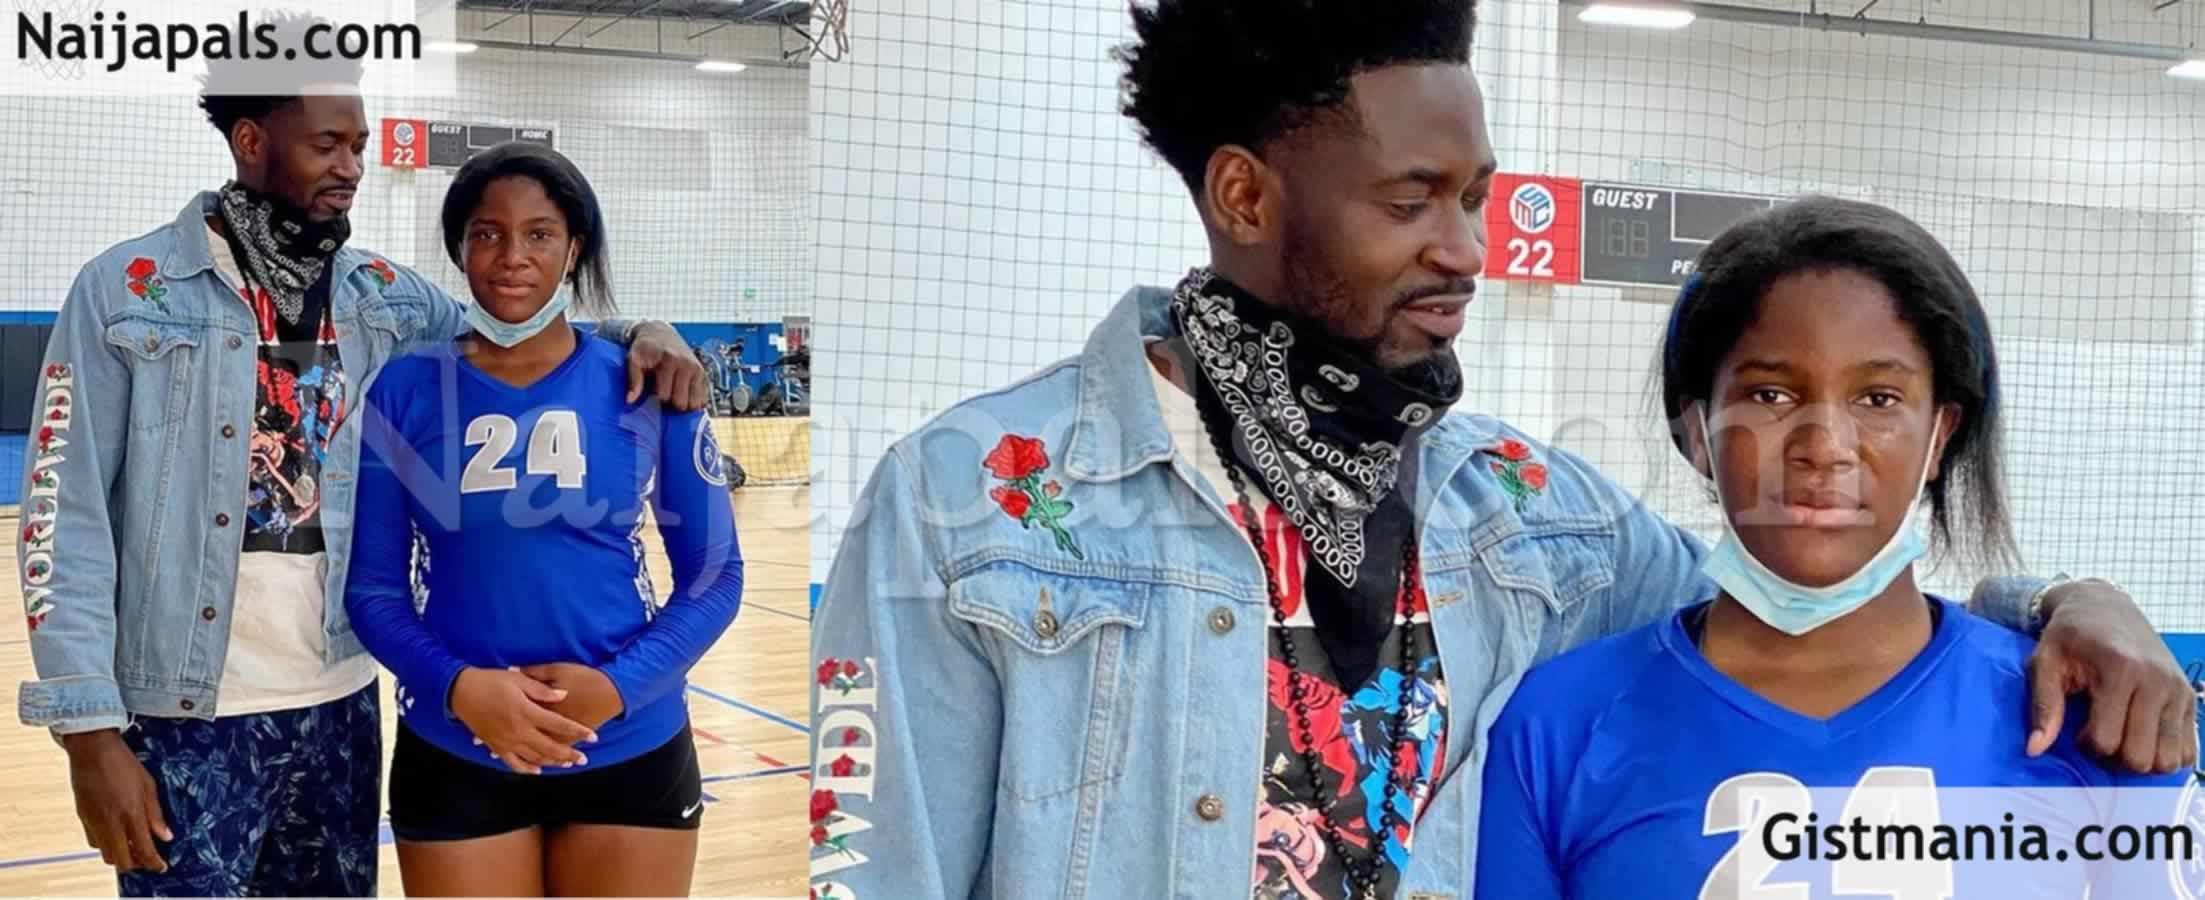 <img alt='.' class='lazyload' data-src='https://img.gistmania.com/emot/video.gif' /> <b>Tiwa Savage's Ex-Husband, Teebillz Shares Video Of His Pretty Daughter Playing Volleyball In US</b>